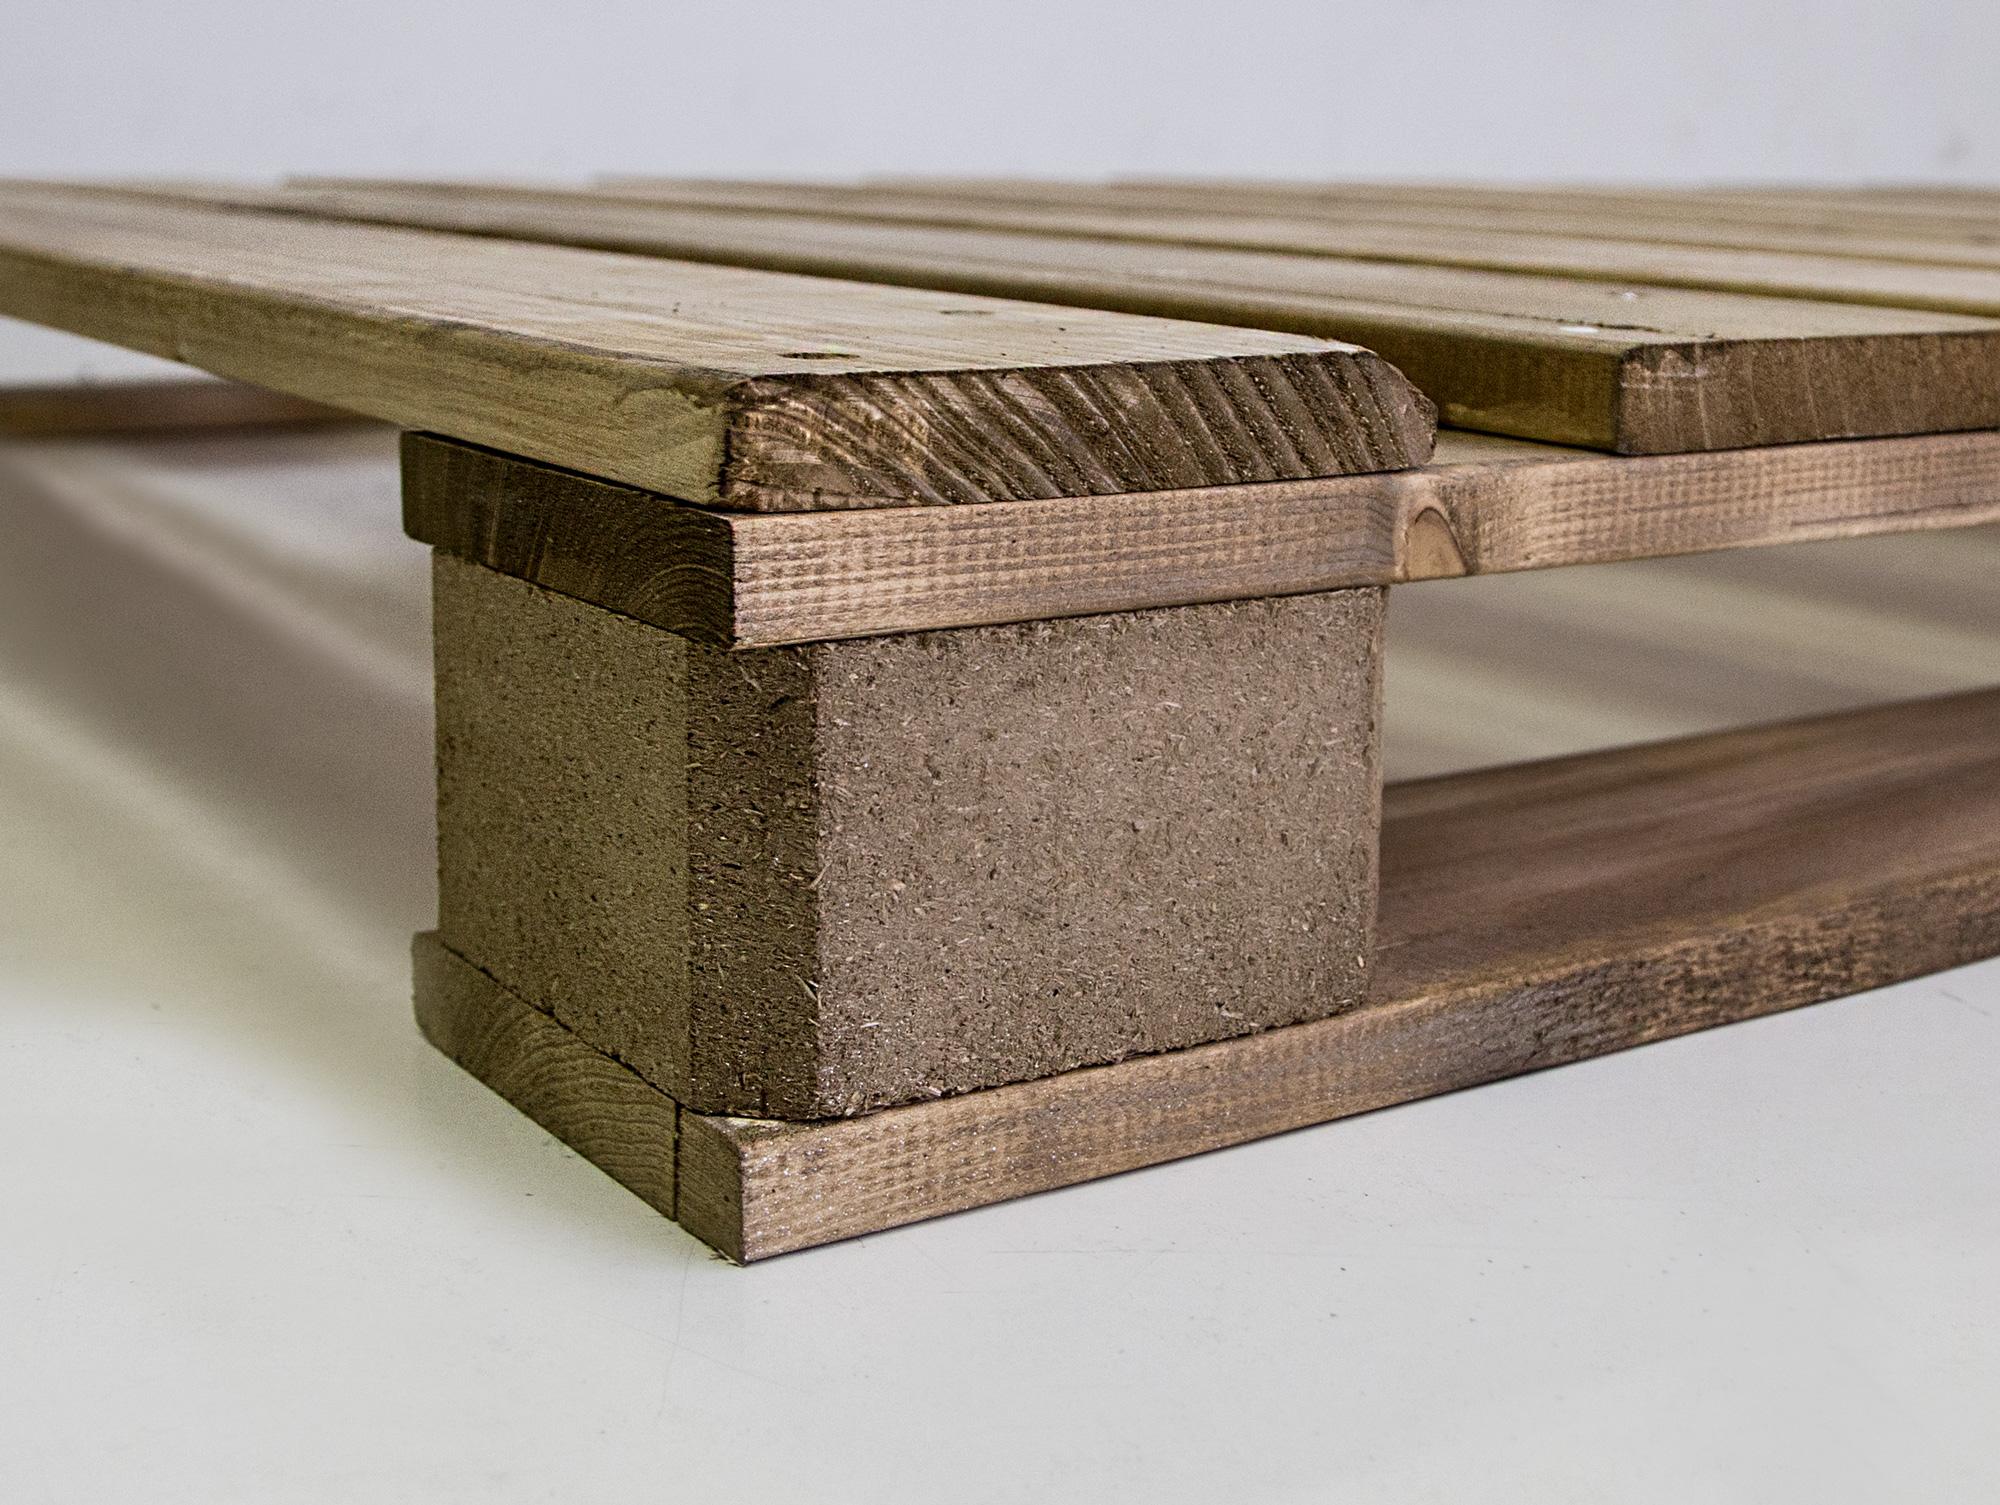 Massivholzbetten rustikal  PALETTI Massivholzbett aus Paletten Rustikal/Vintage gebeizt 90 x ...